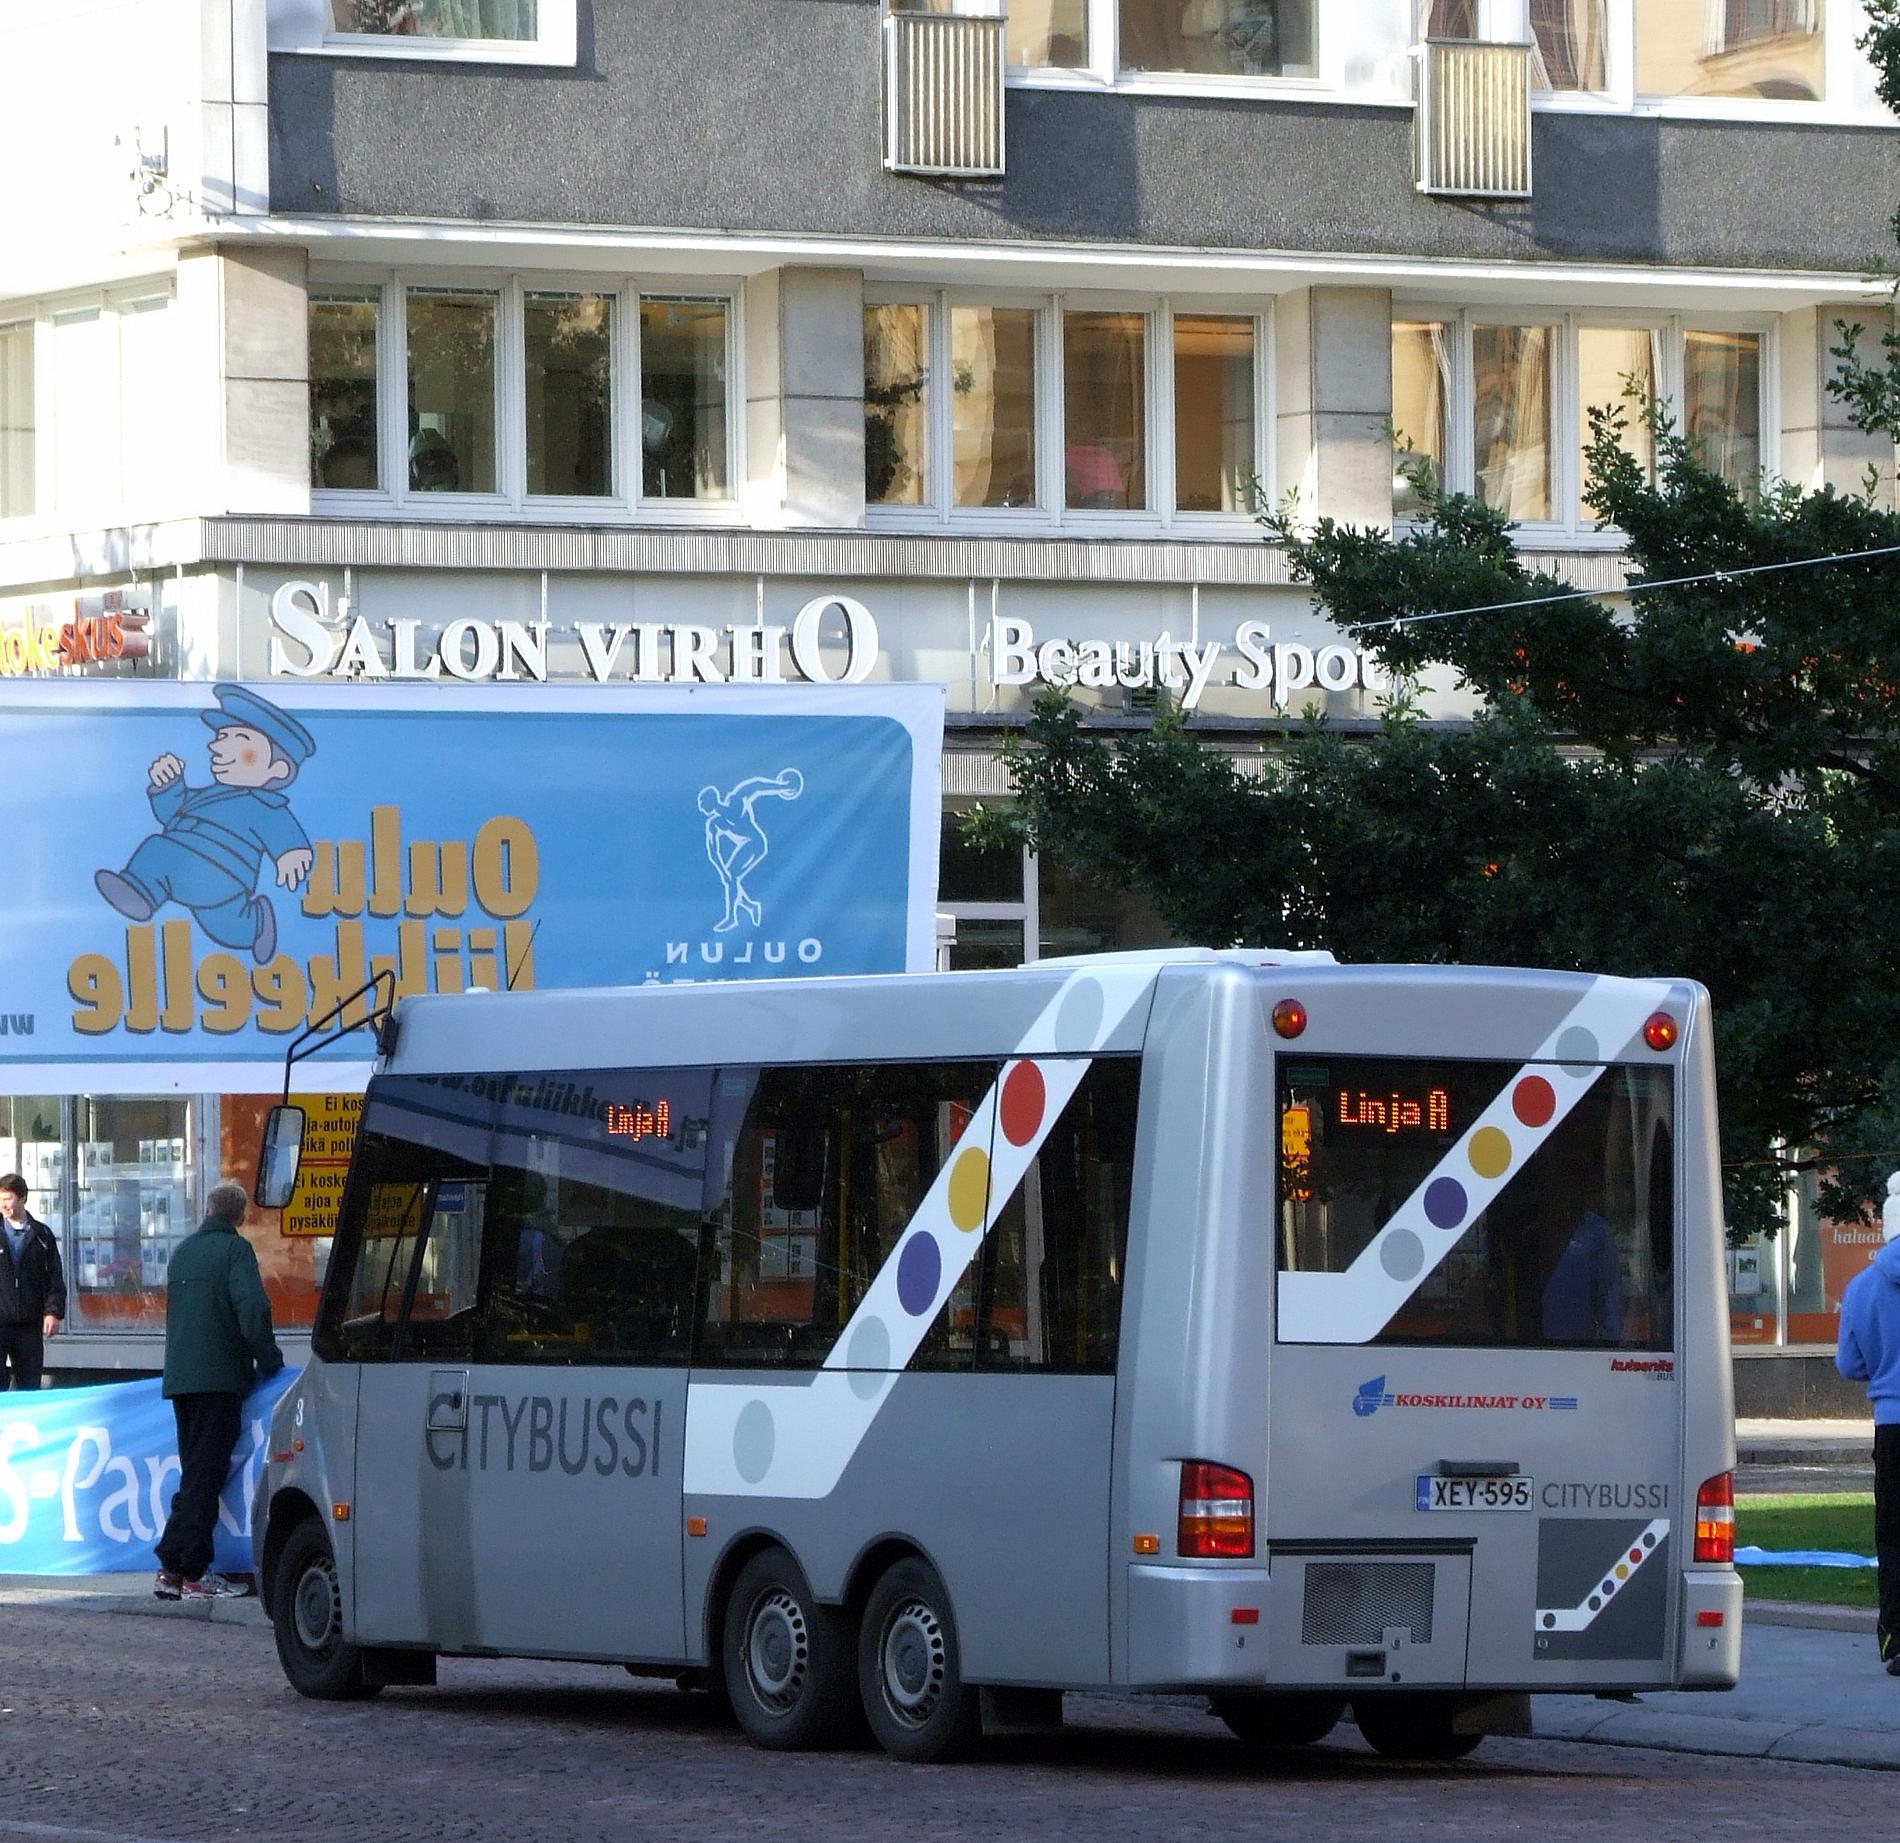 Oulu Citybussi